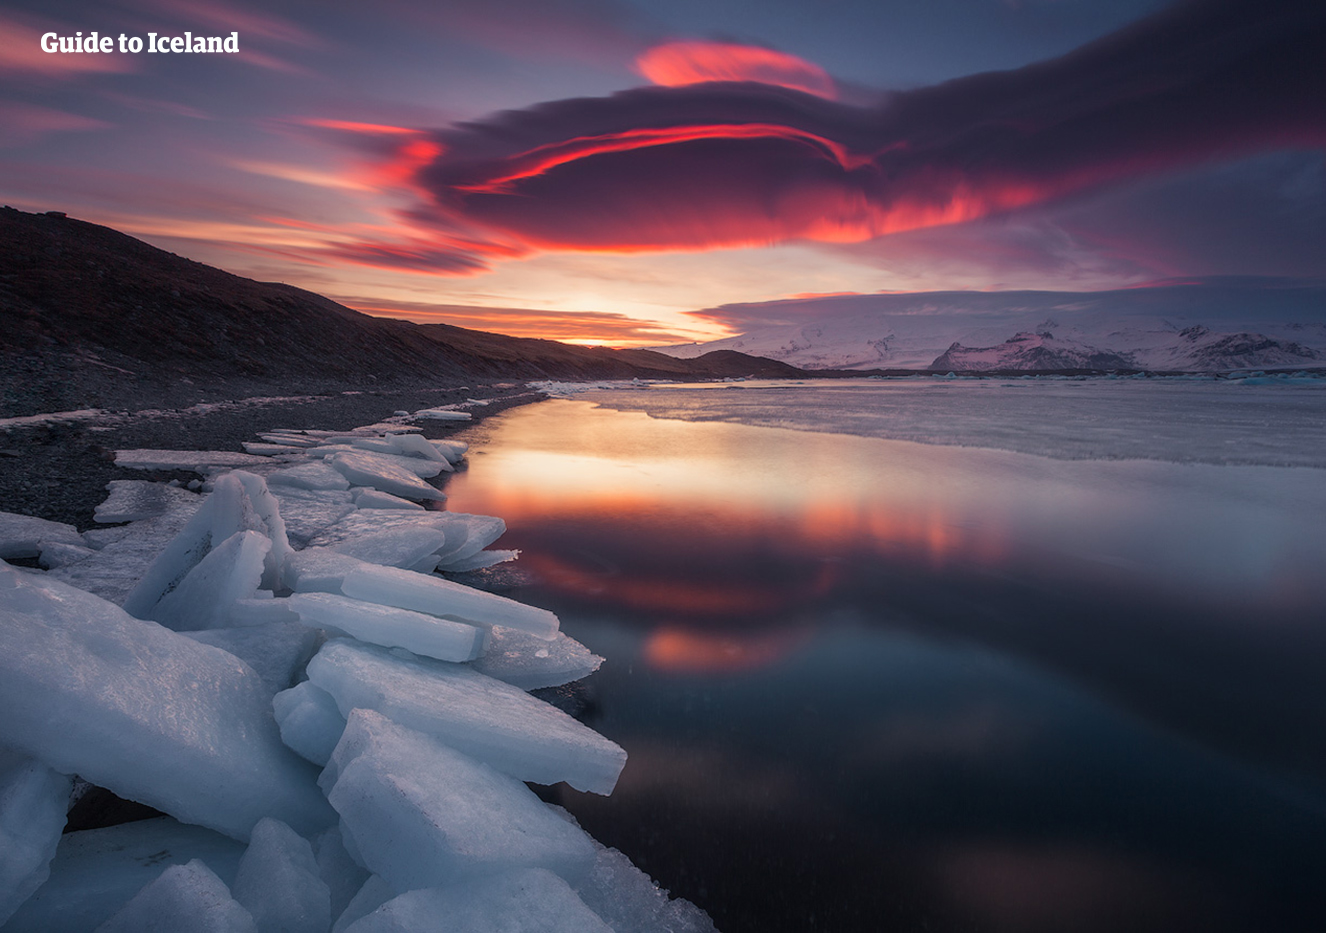 The red evening sky mirrored in the serene Jökulsárlón glacier lagoon.